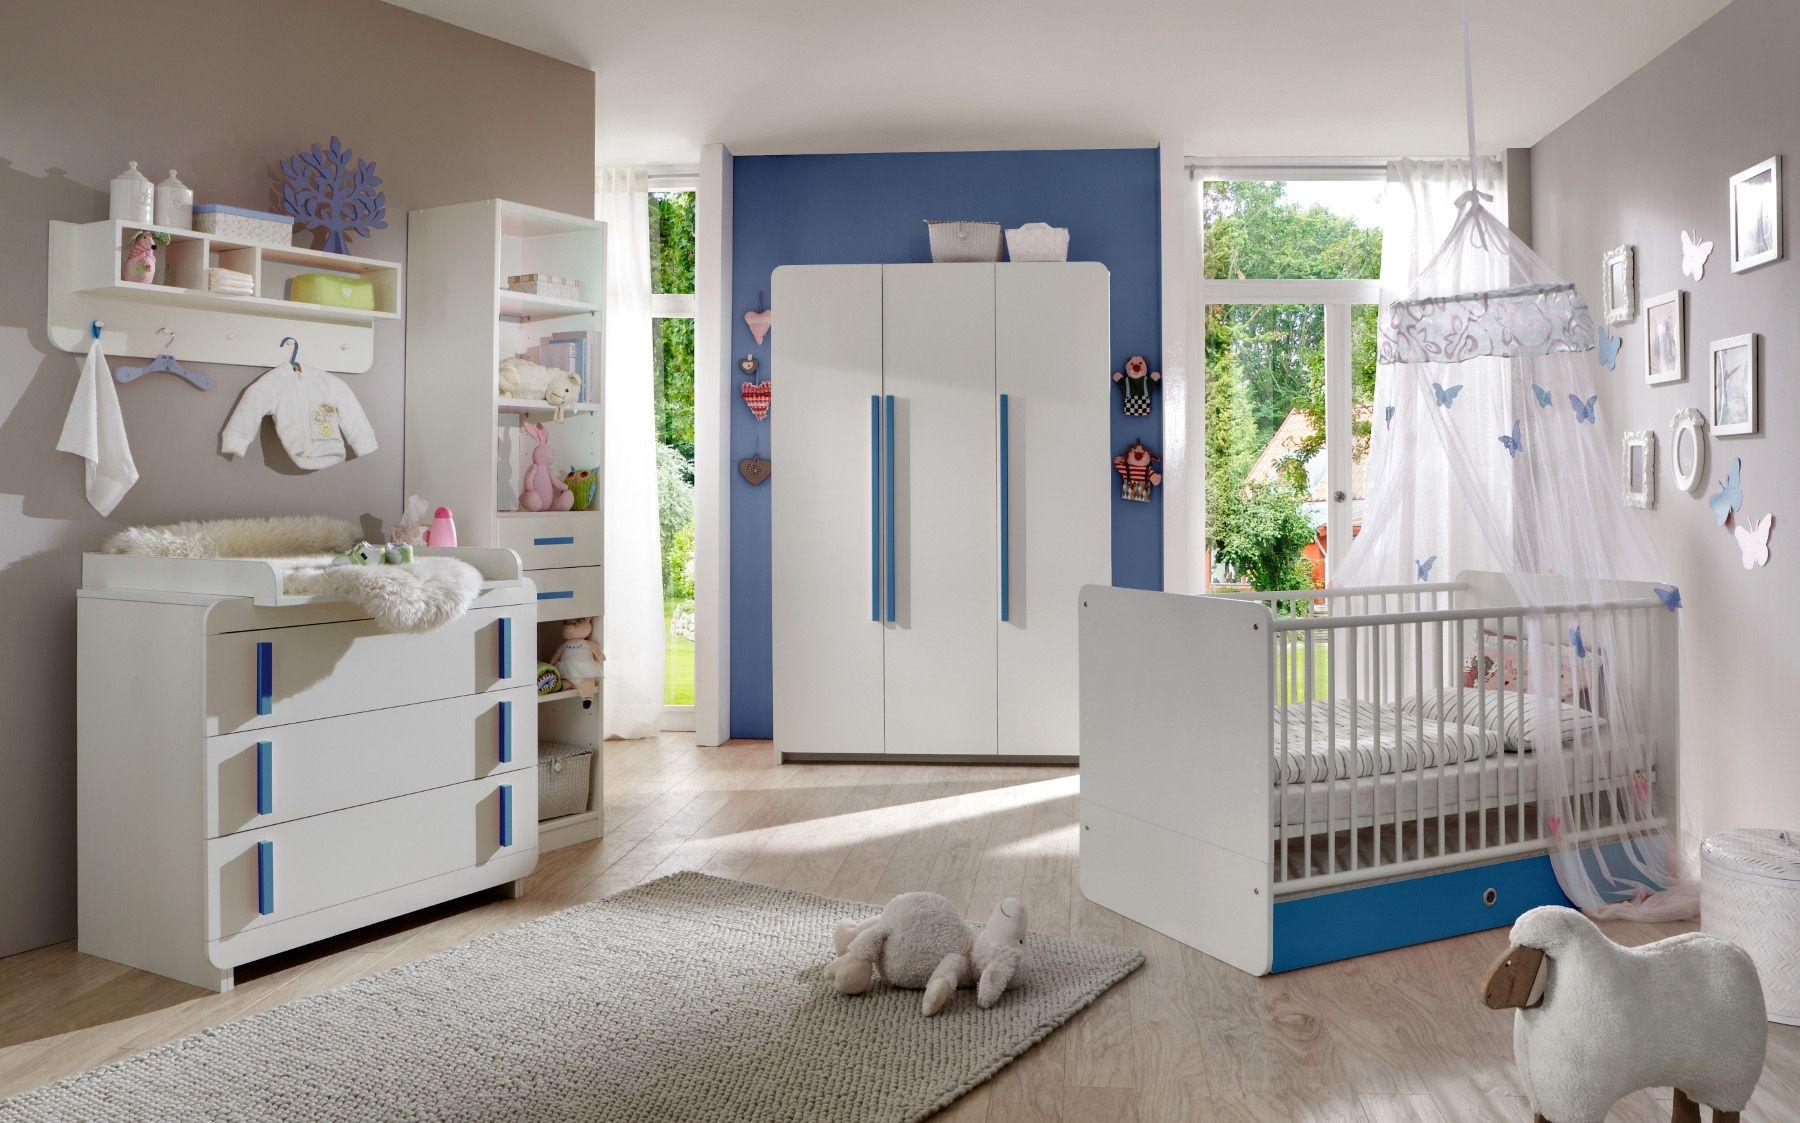 35 Gardinen Wohnzimmer Ideen